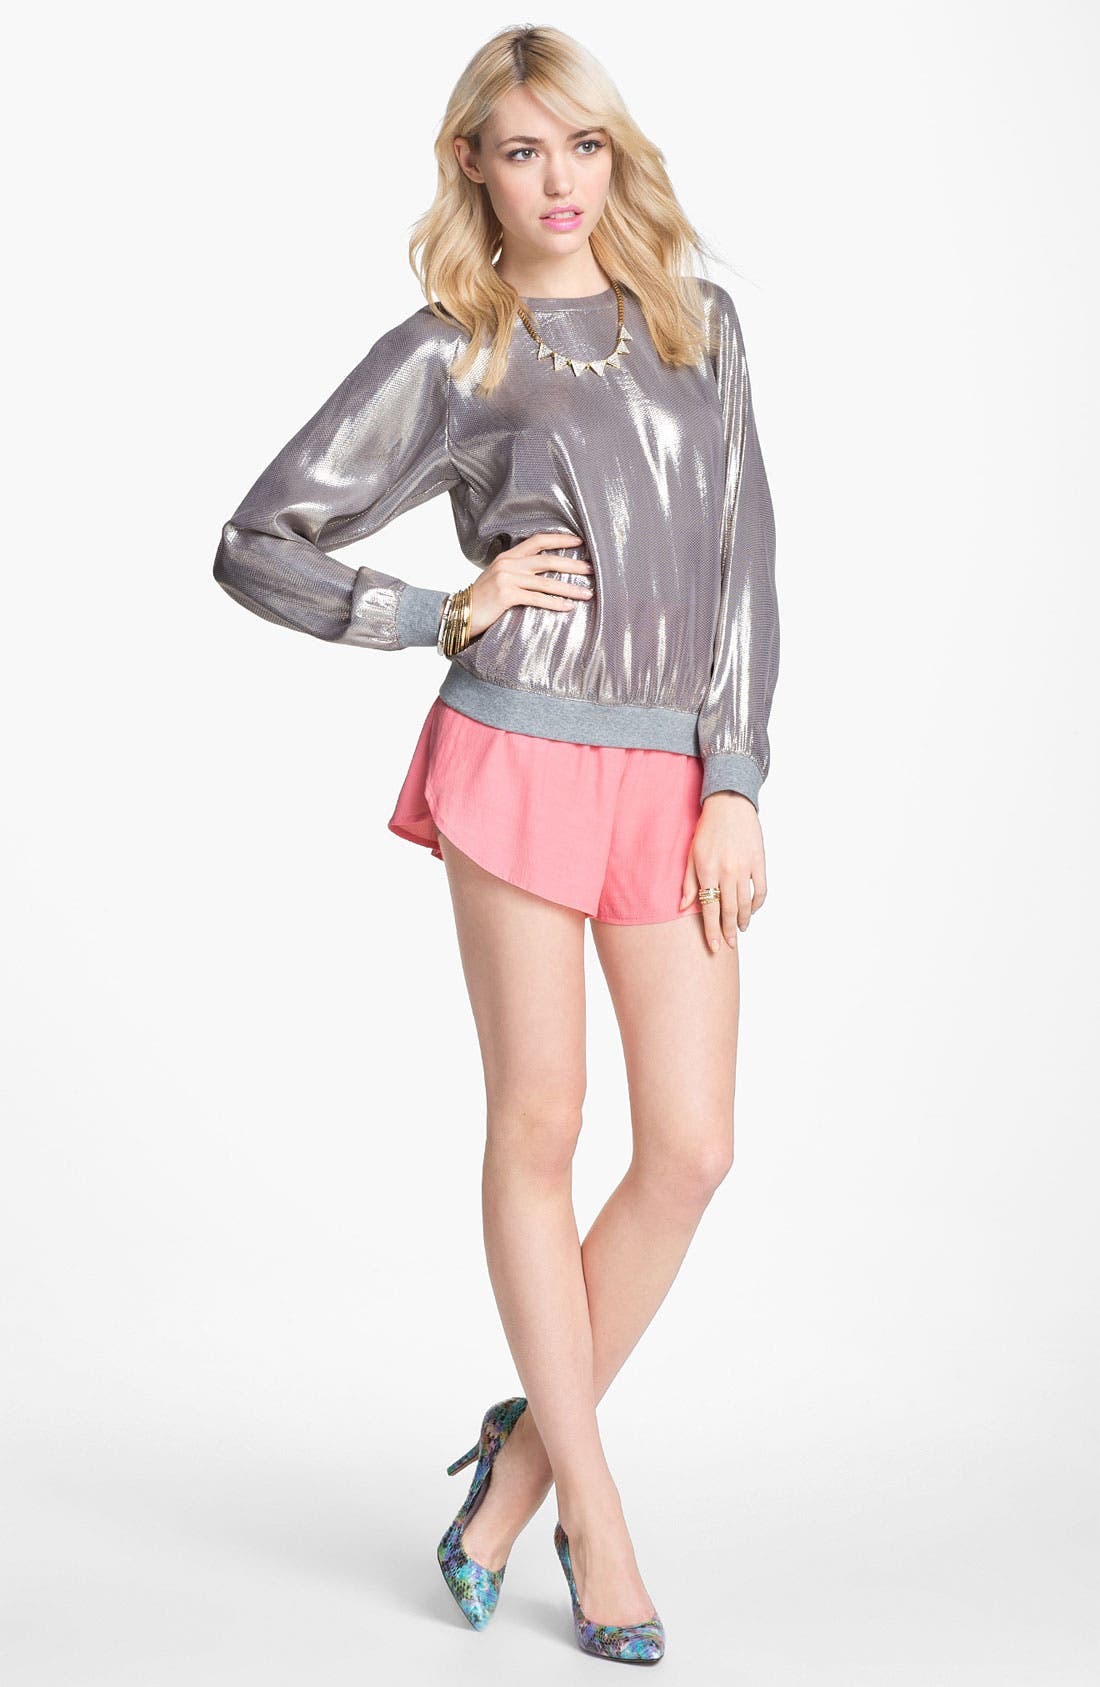 Alternate Image 1 Selected - Mural Sweatshirt, BB Dakota Lace Trim Shorts & Vince Camuto Pump